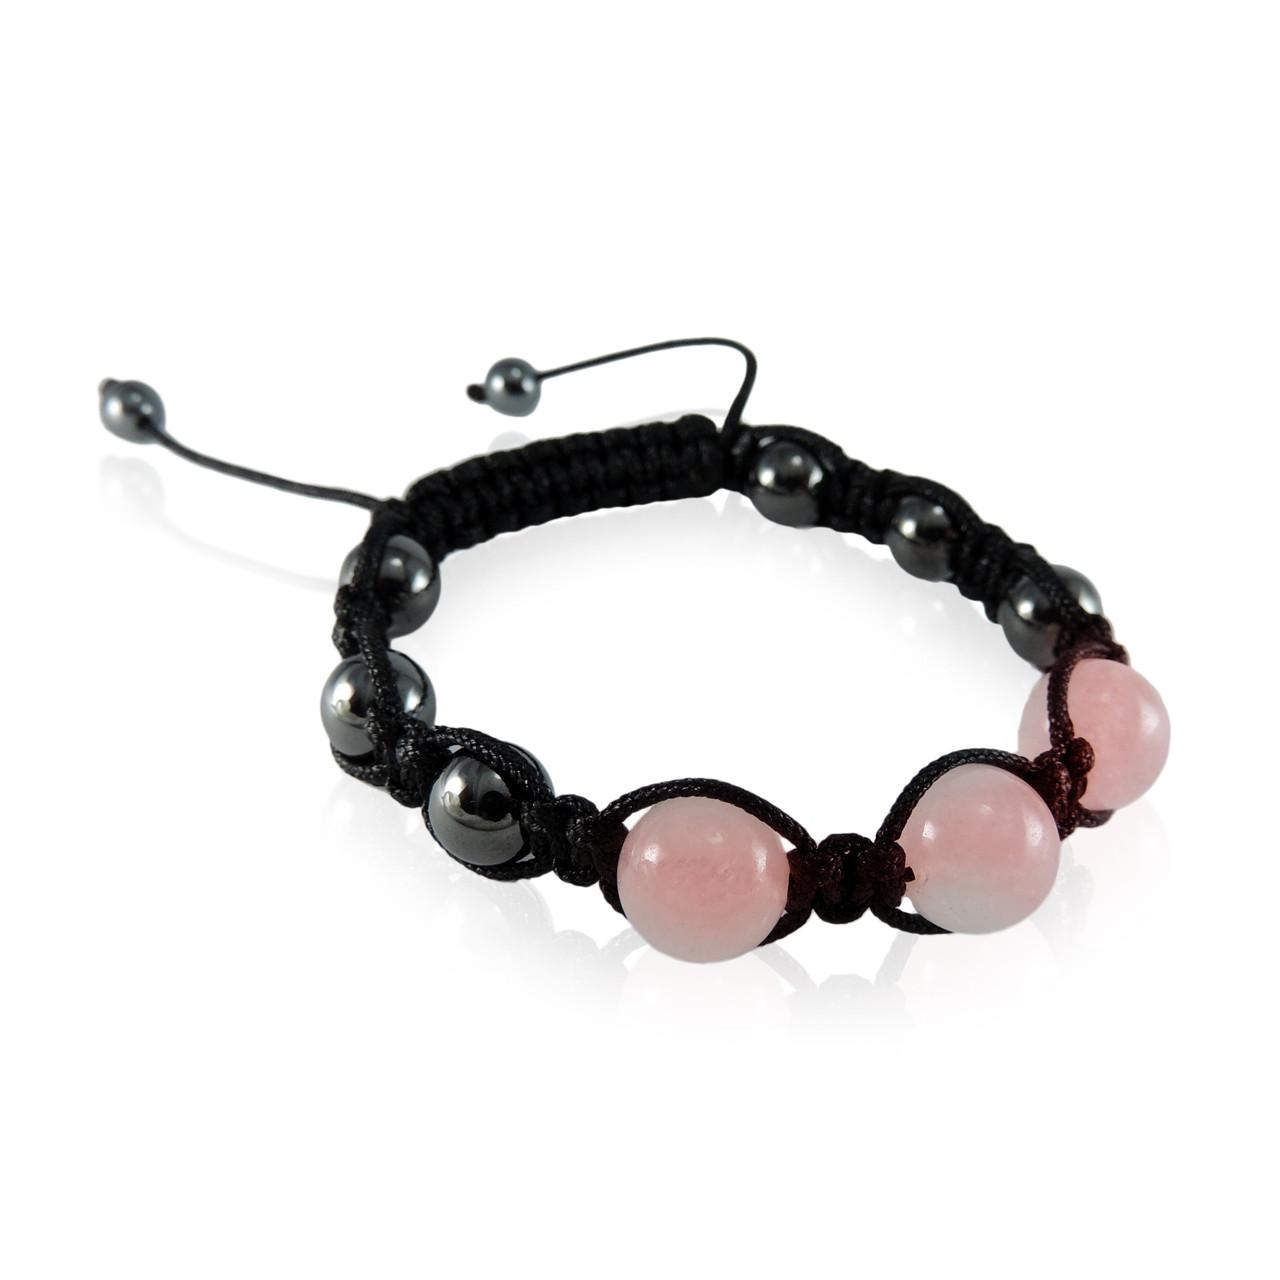 GBR-KGB10r Rose Quartz Magnetic Bracelet